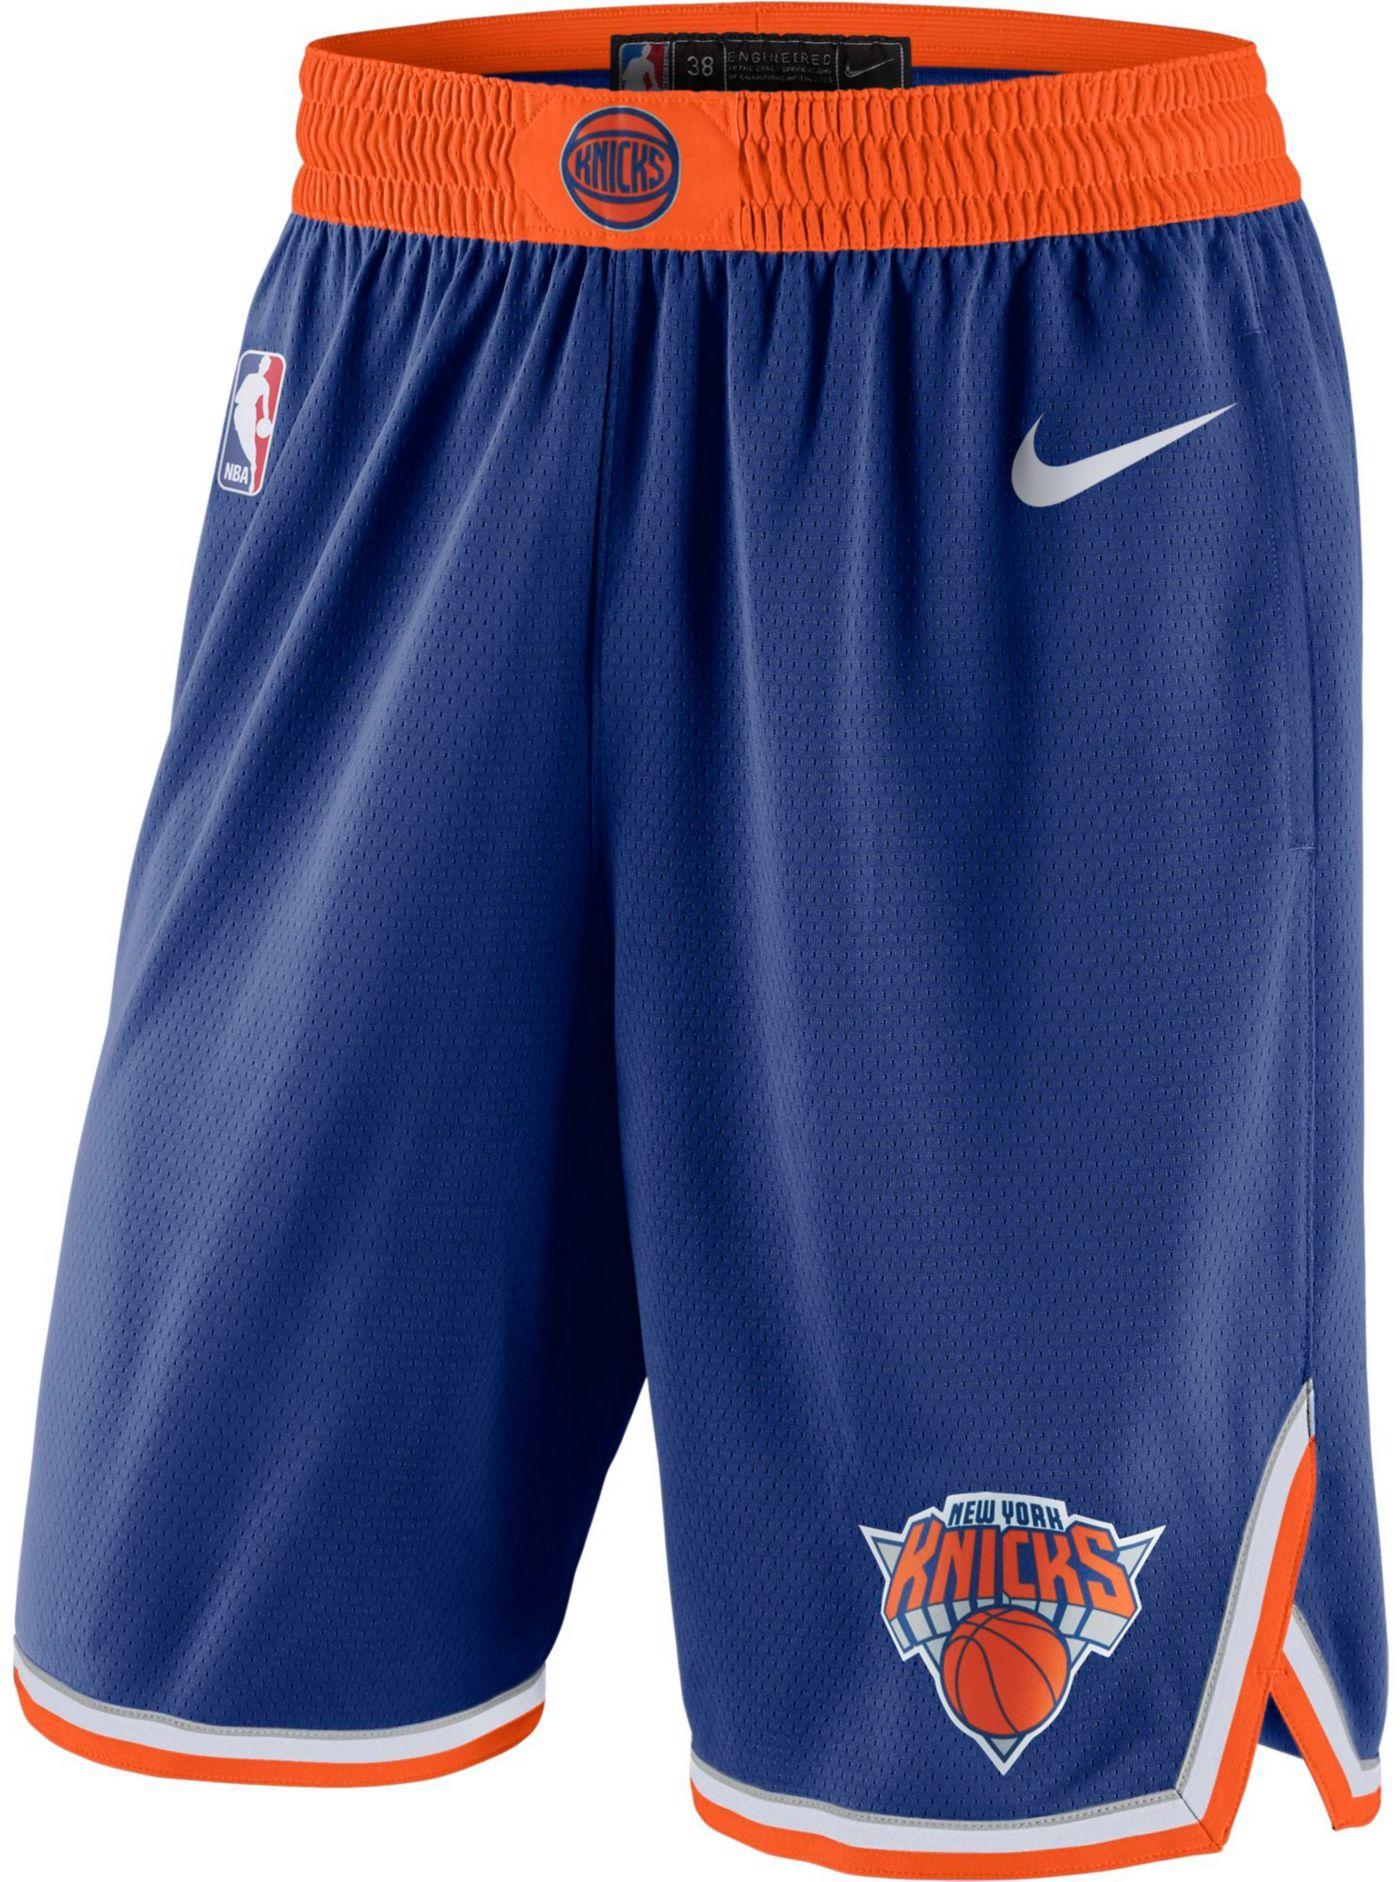 Nike Men's New York Knicks Dri-FIT Swingman Shorts